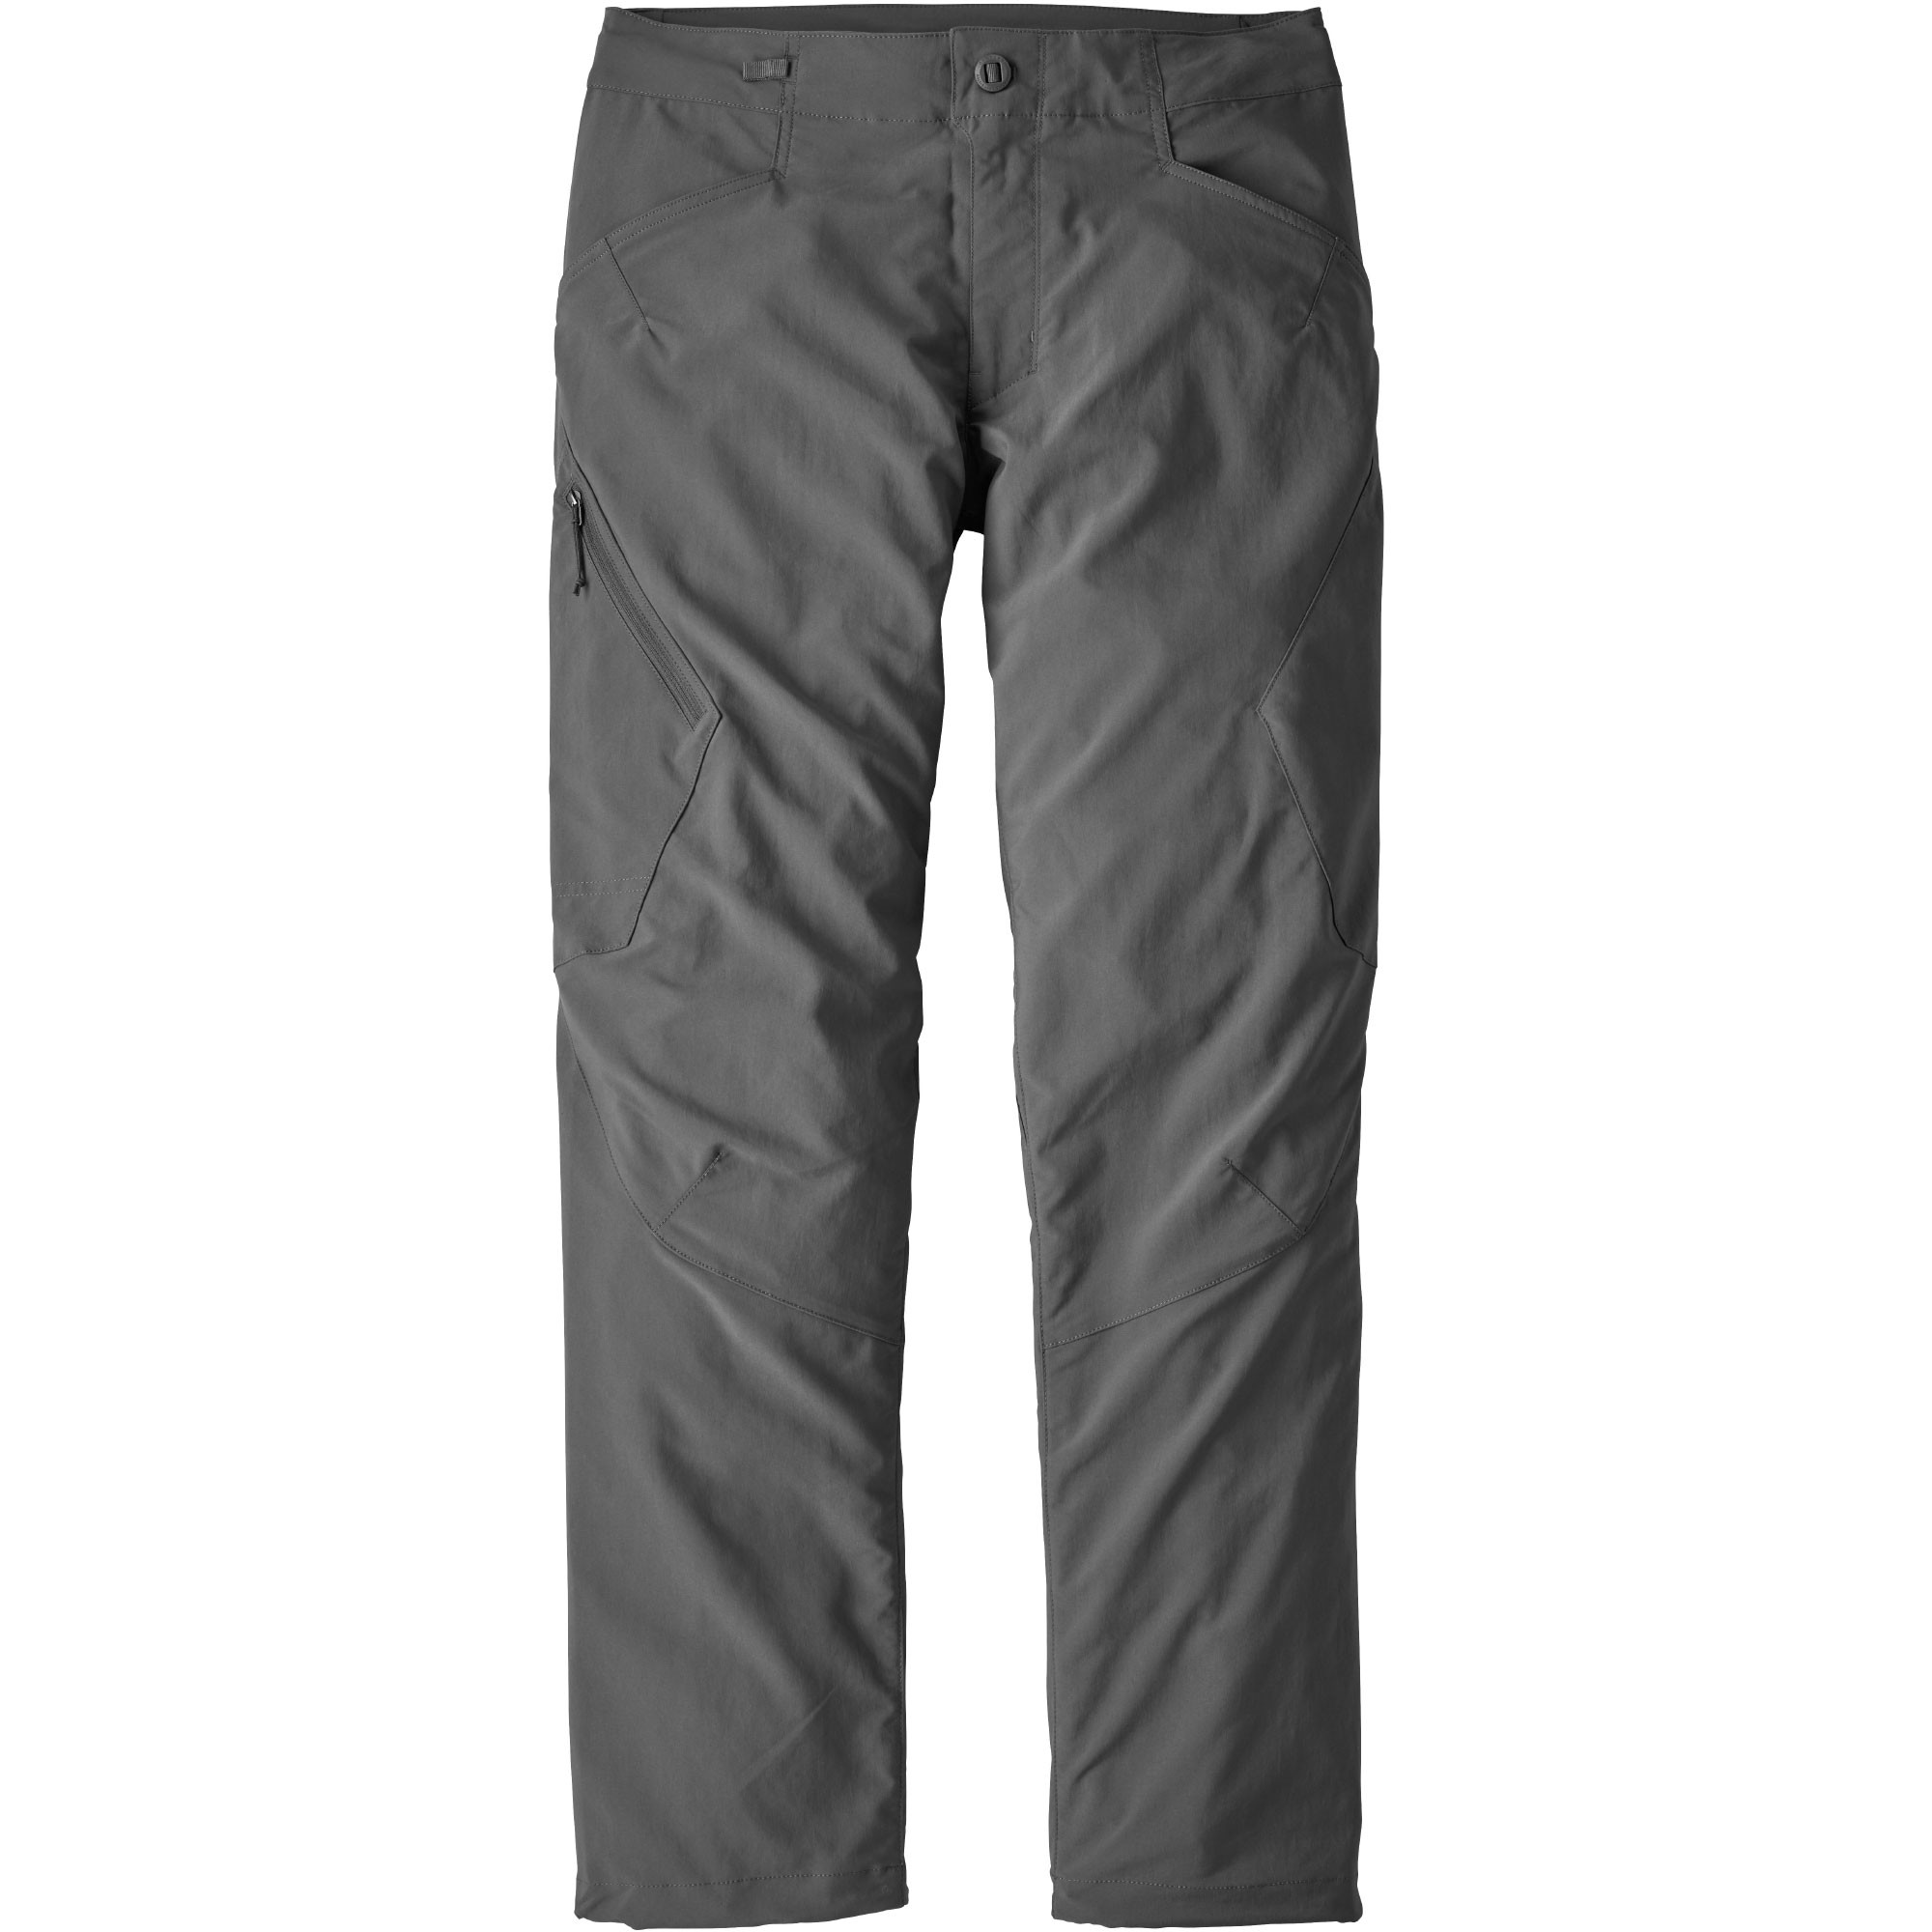 Patagonia Men's RPS Rock Pants Forge Grey